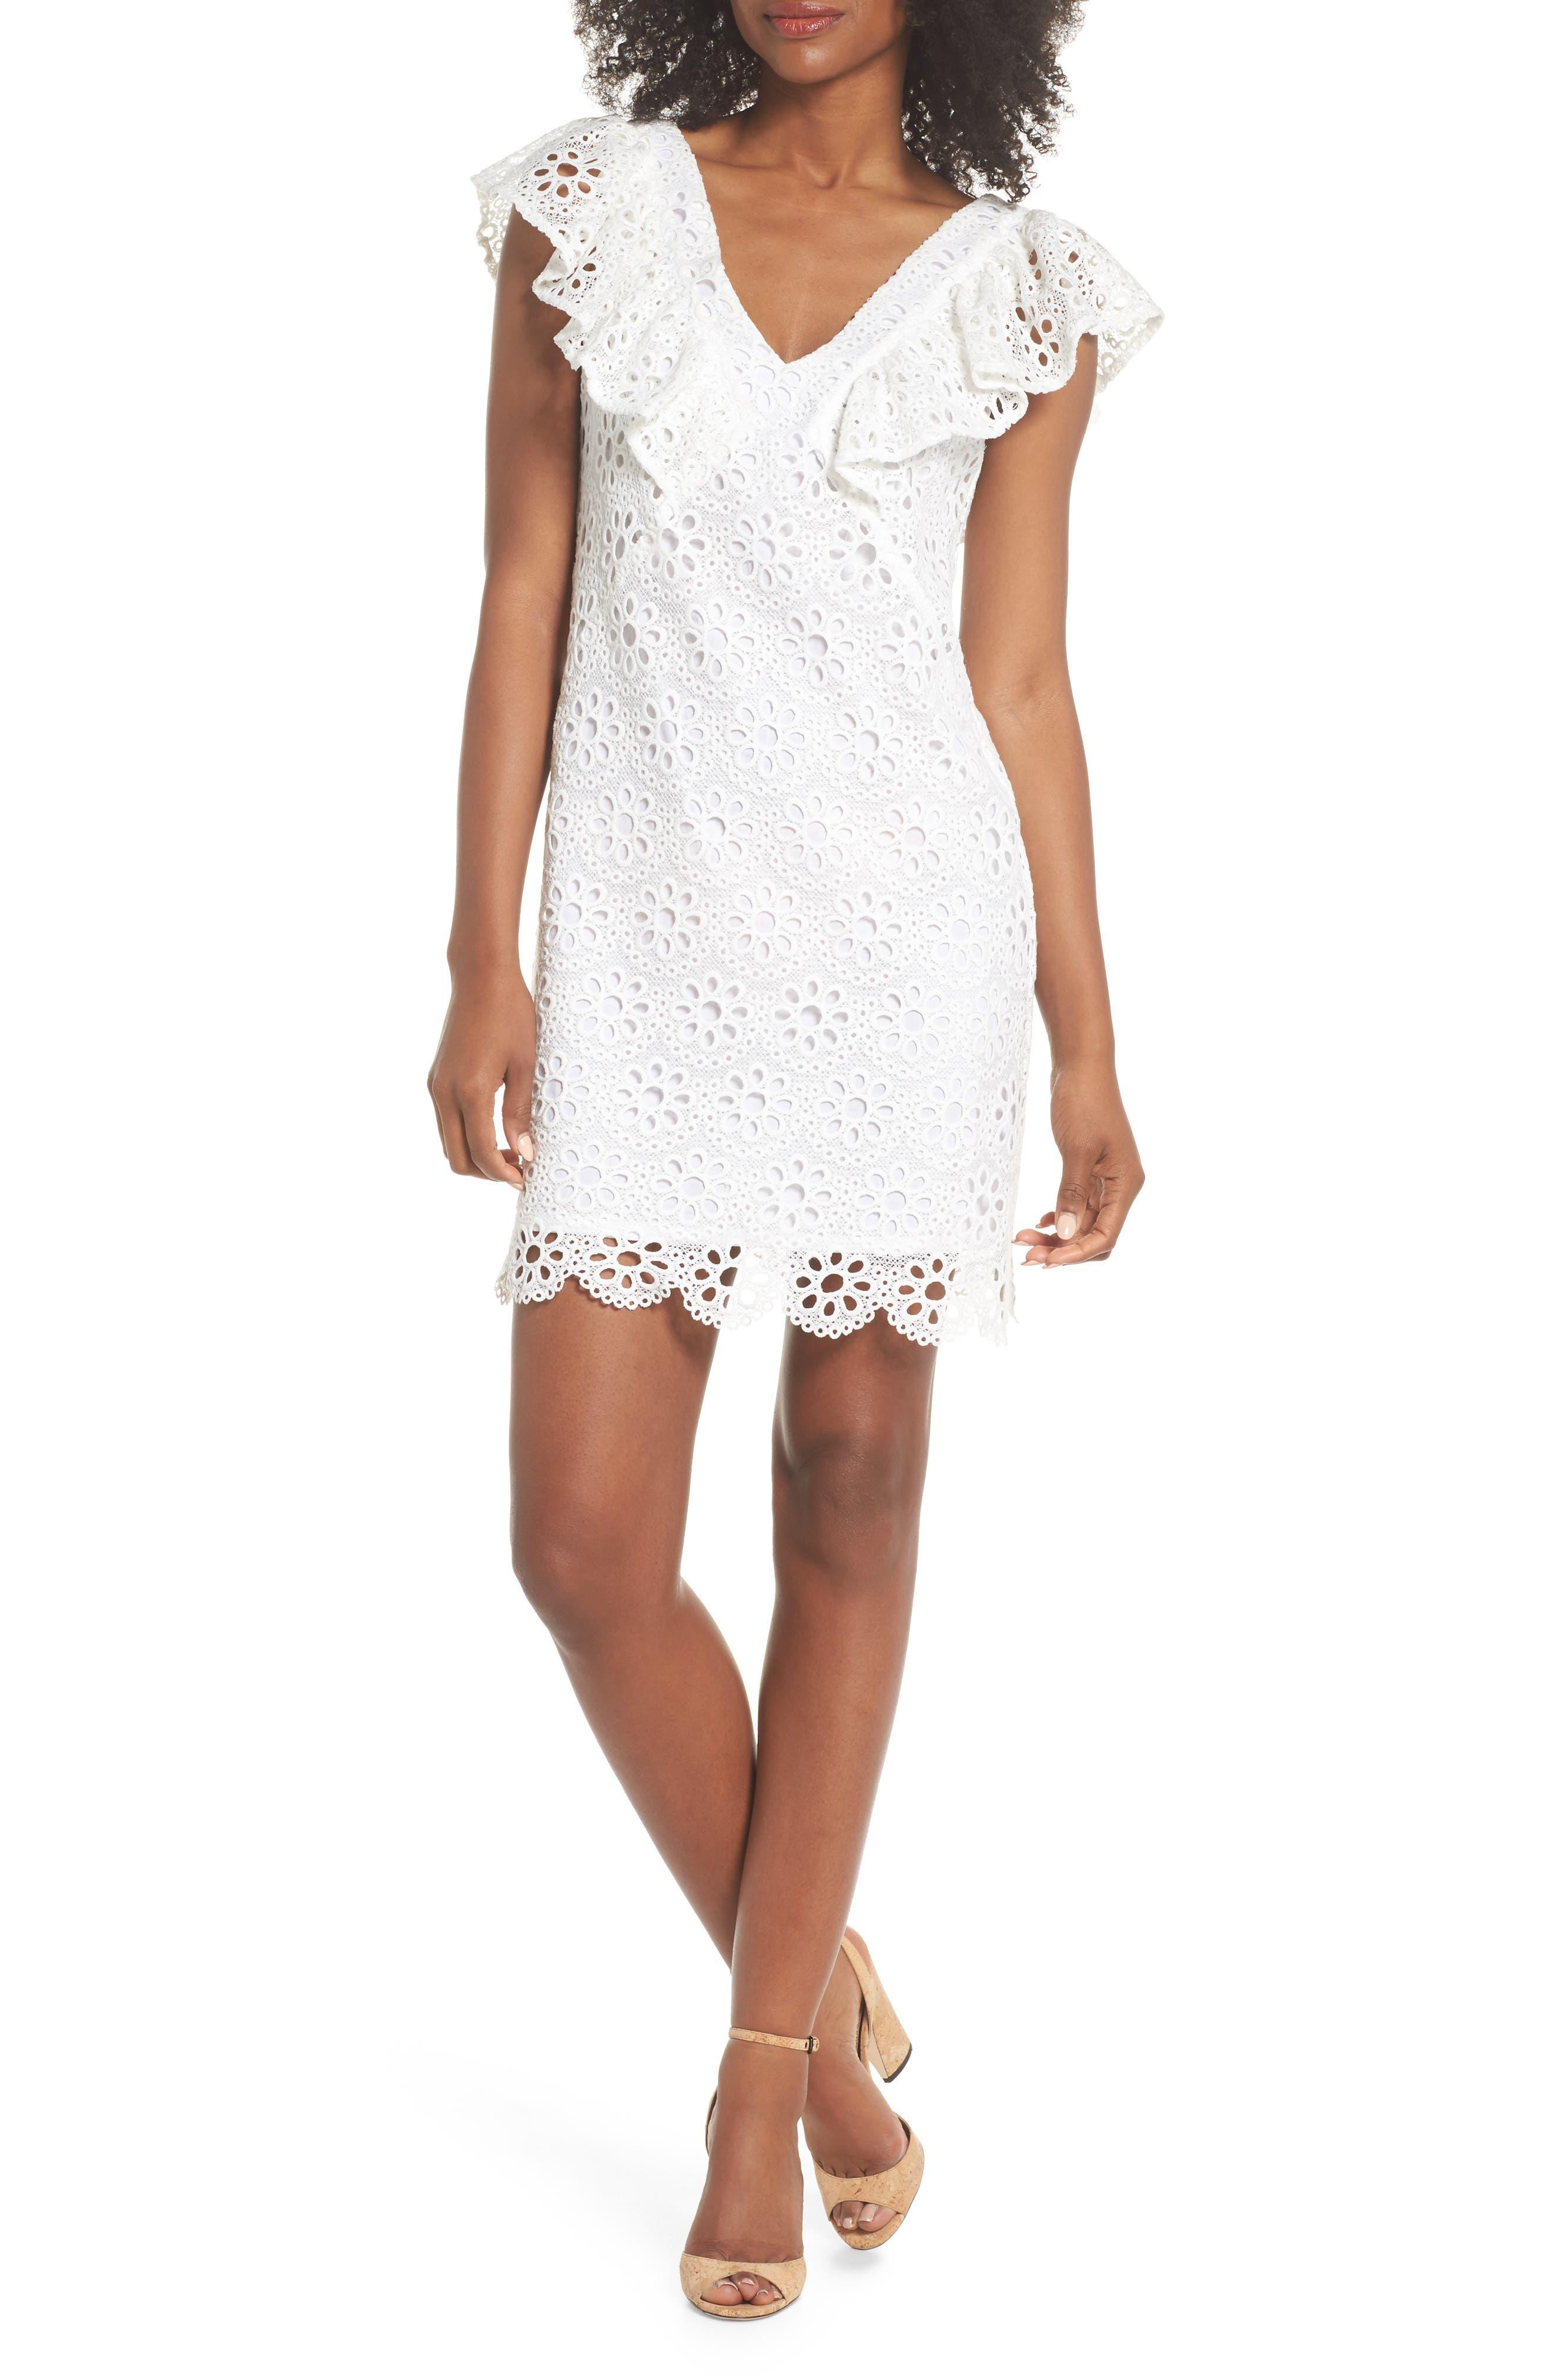 Neriah Eyelet Embroidered Dress,                             Main thumbnail 1, color,                             Whitewash